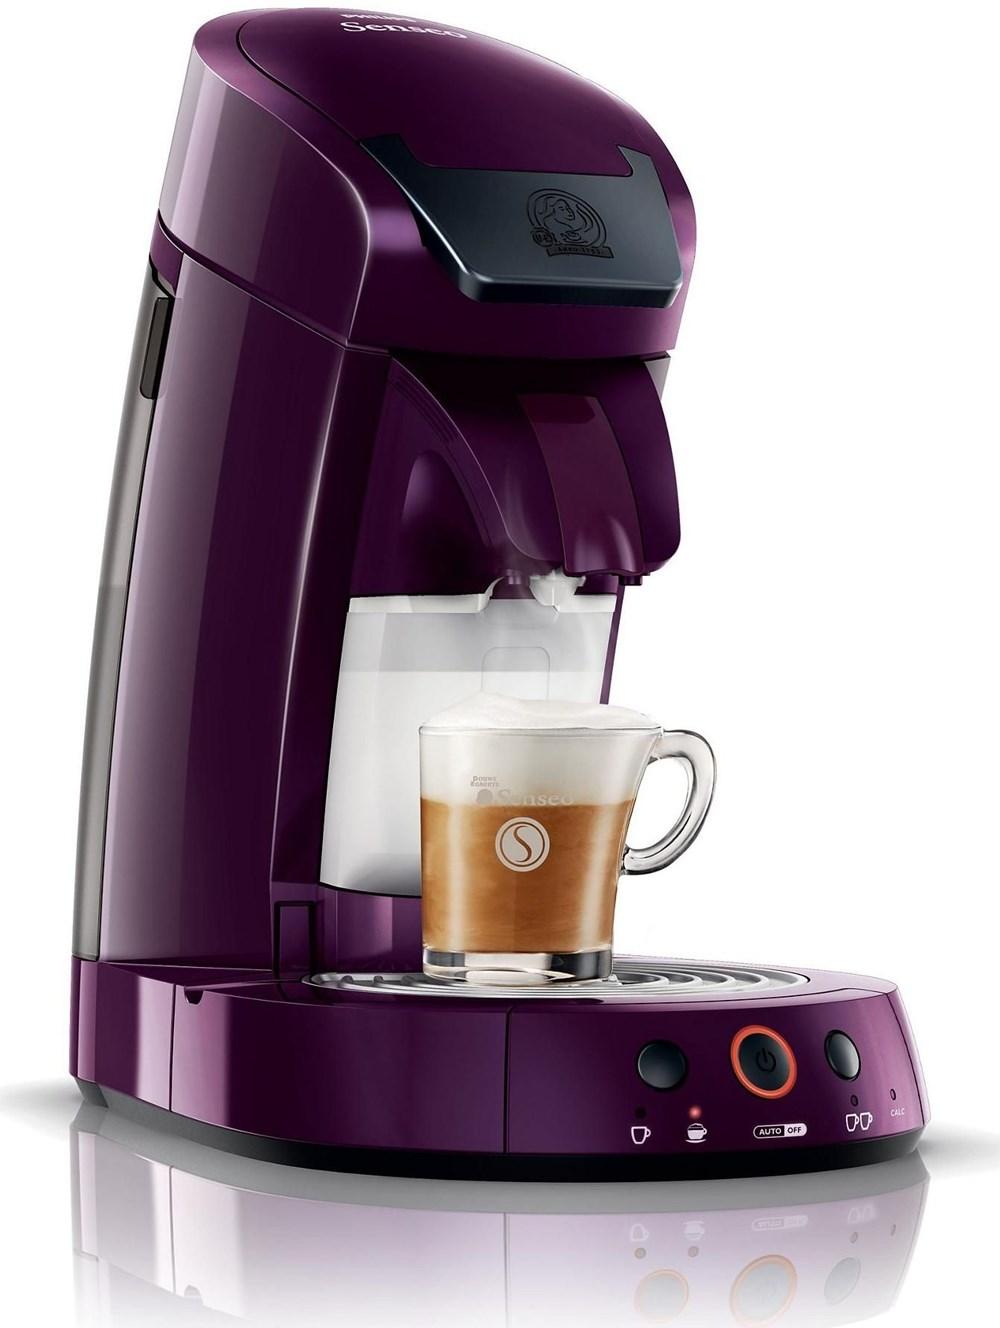 Philips HD7853 Senseo Cappuccino Select rubinrot - Coffee Pod / Capsule Machines - computeruniverse